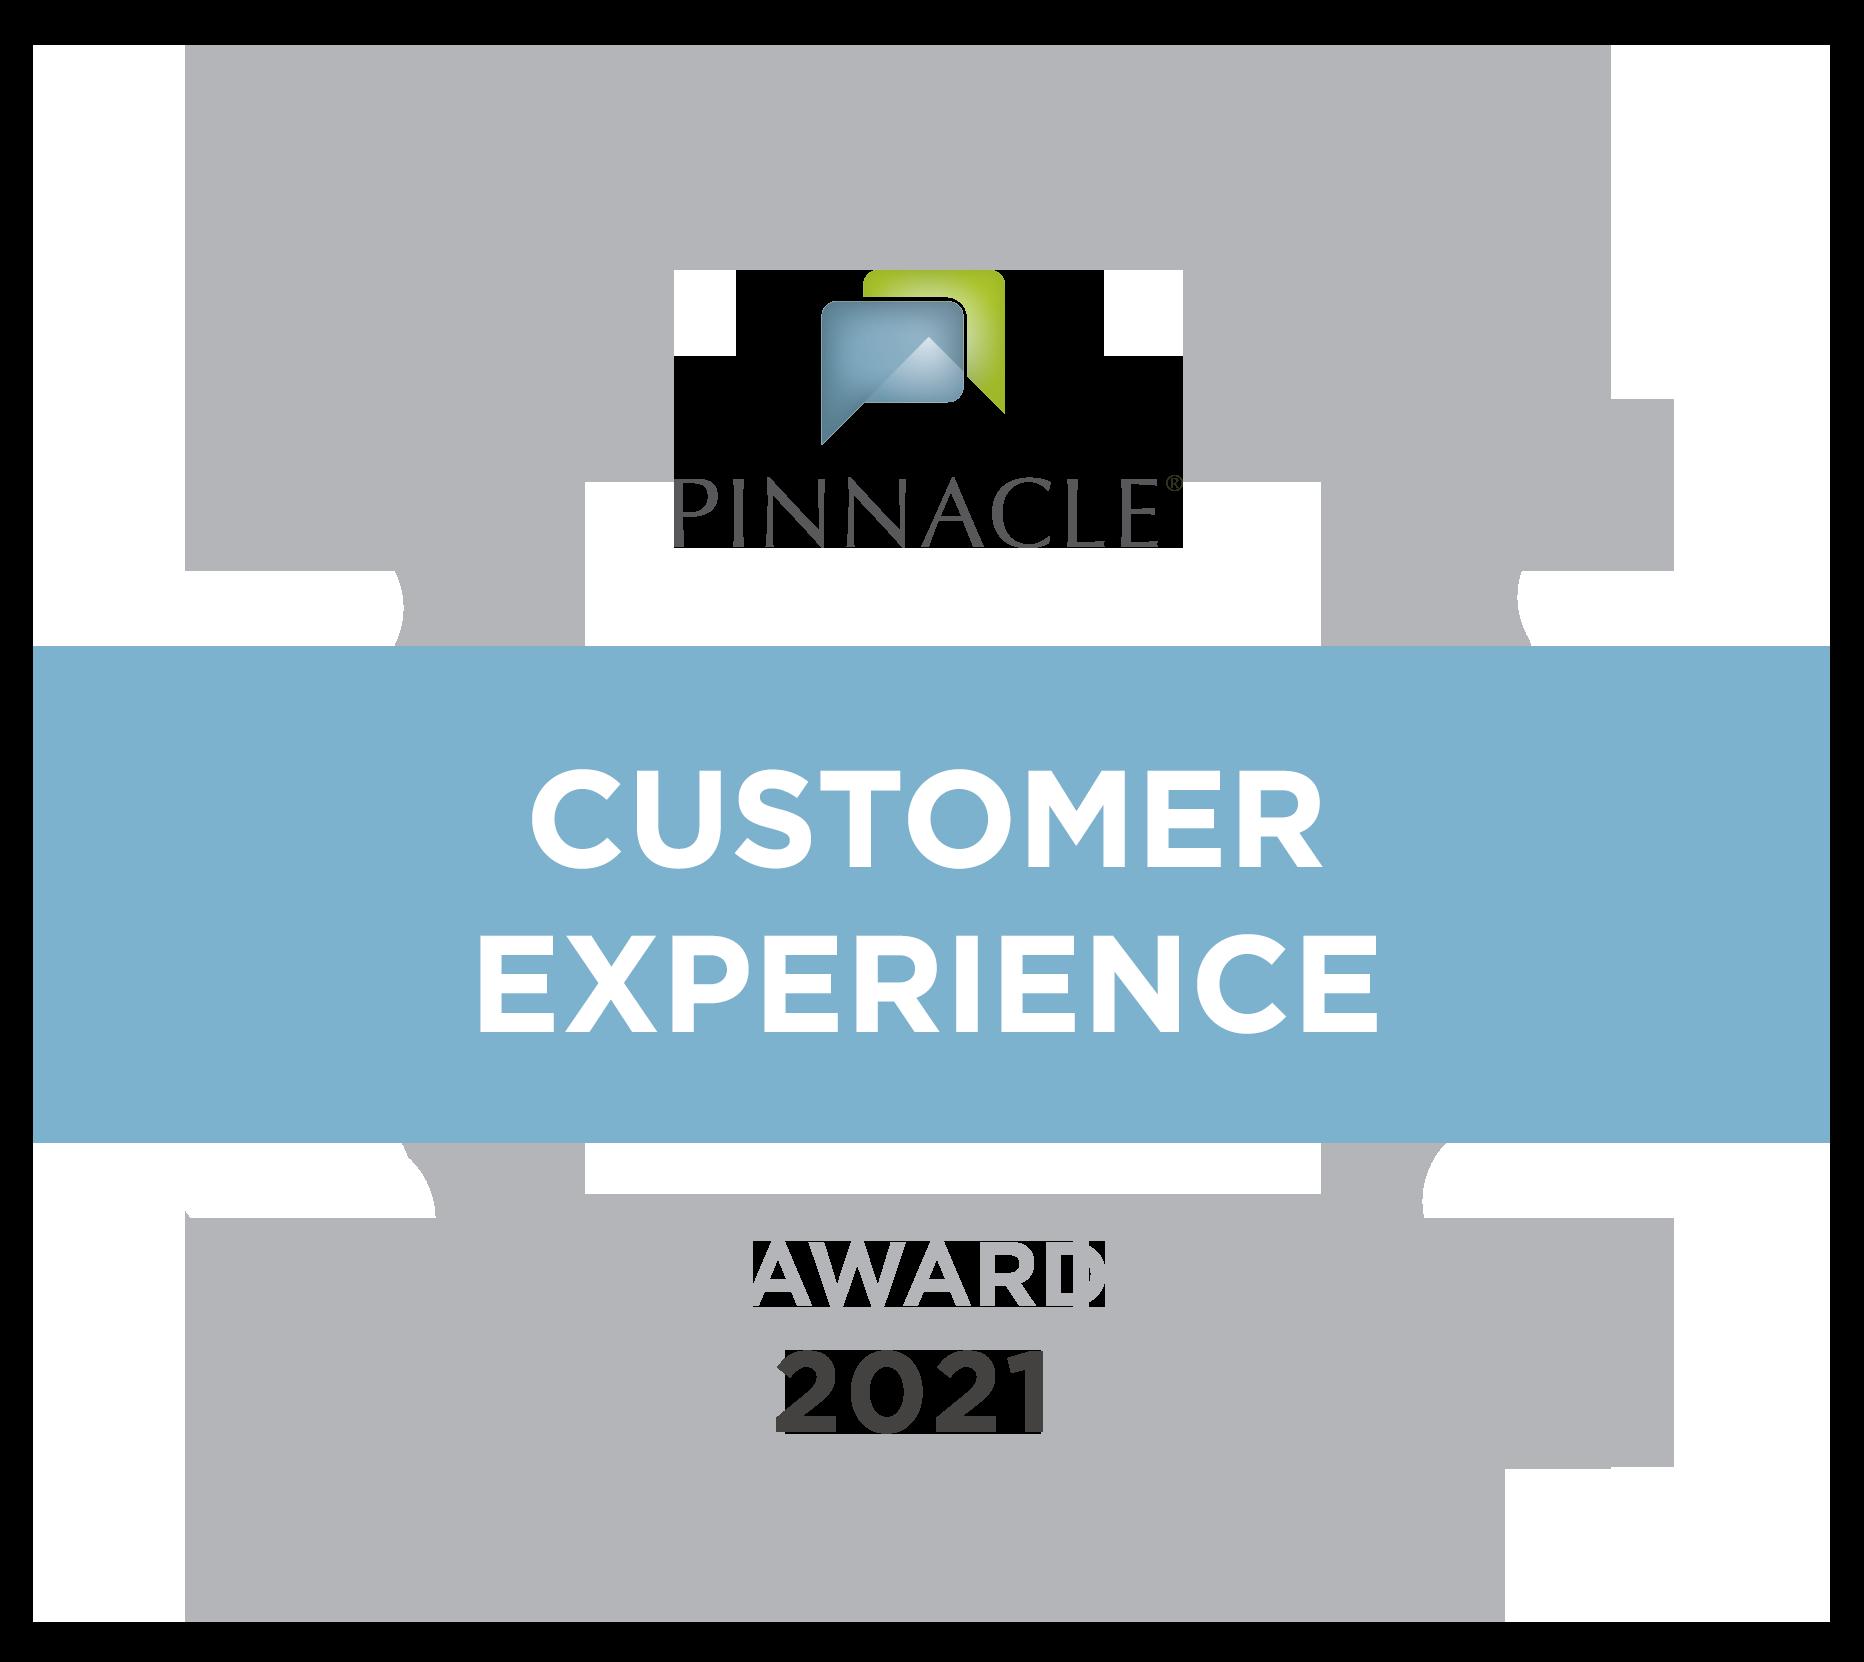 Pinnacle Customer Experience Award 2021